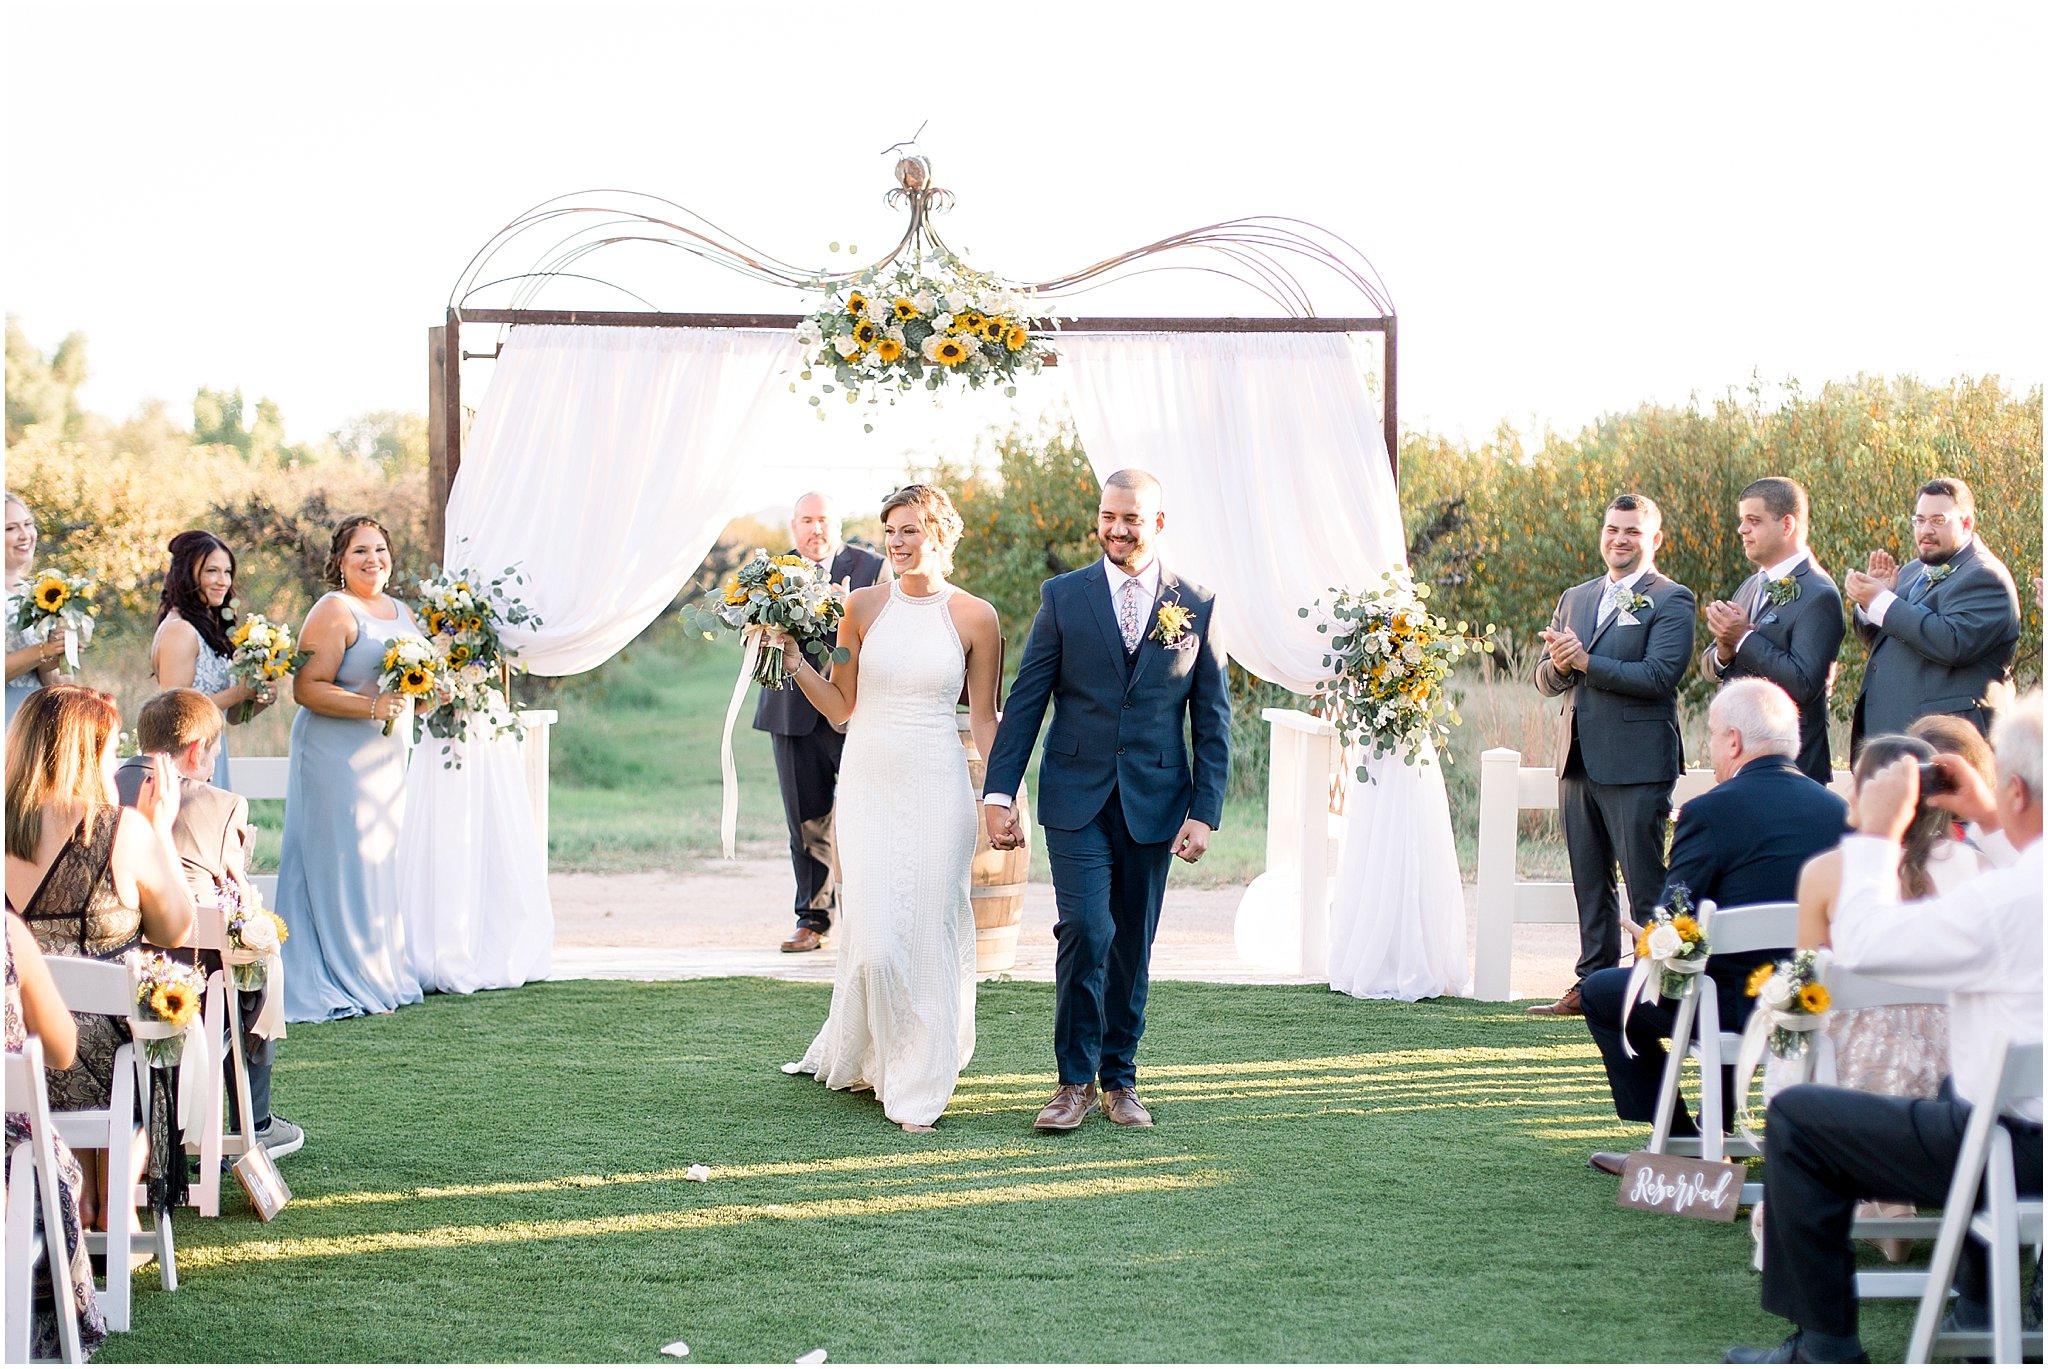 Hyatt-Lodge-Mcdonald-Campus-Wedding_0140.jpg